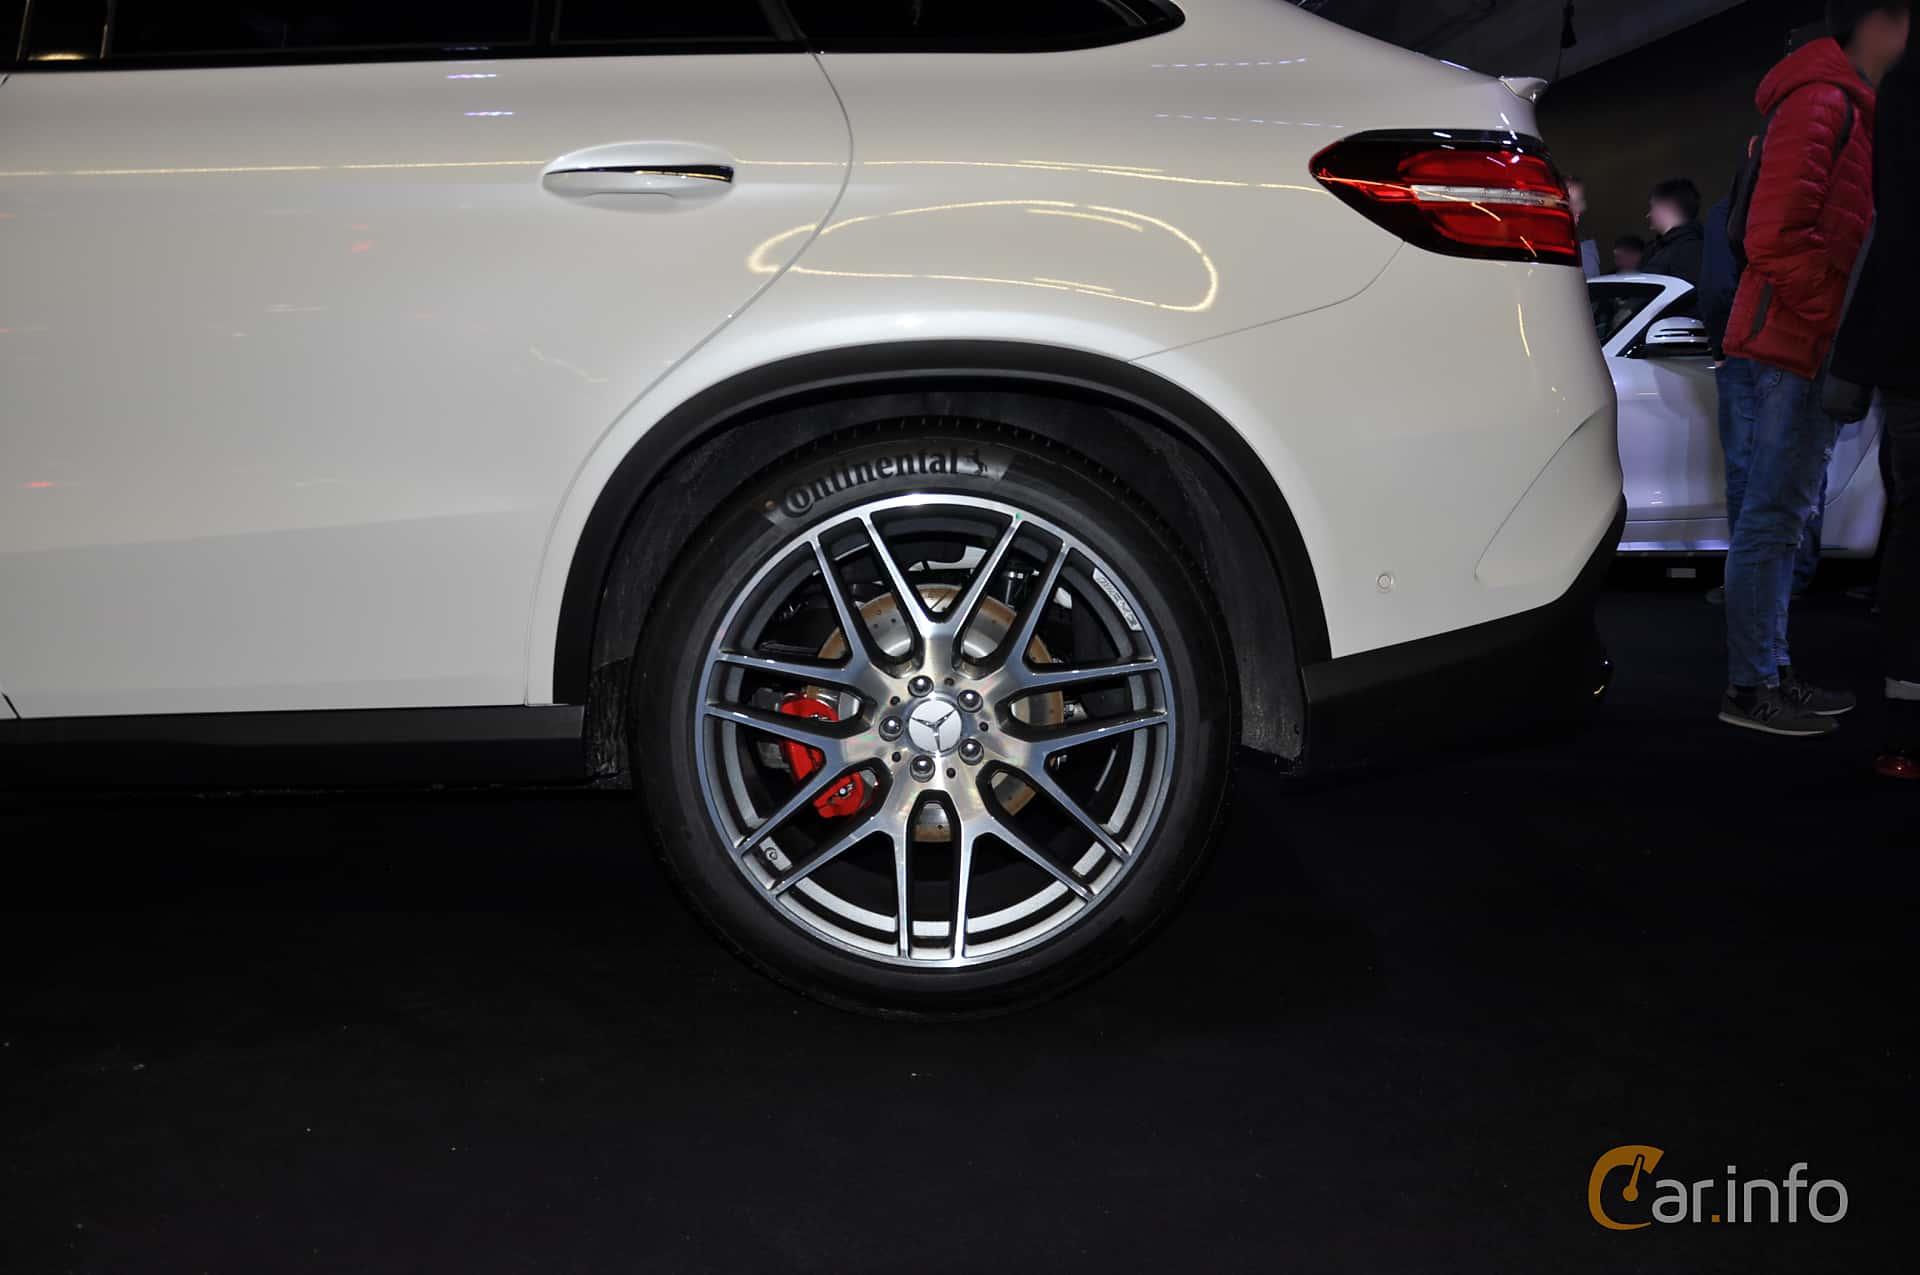 Mercedes-Benz AMG GLE 63 S Coupé  AMG SpeedShift Plus 7G-Tronic, 585hp, 2018 at Warsawa Motorshow 2018